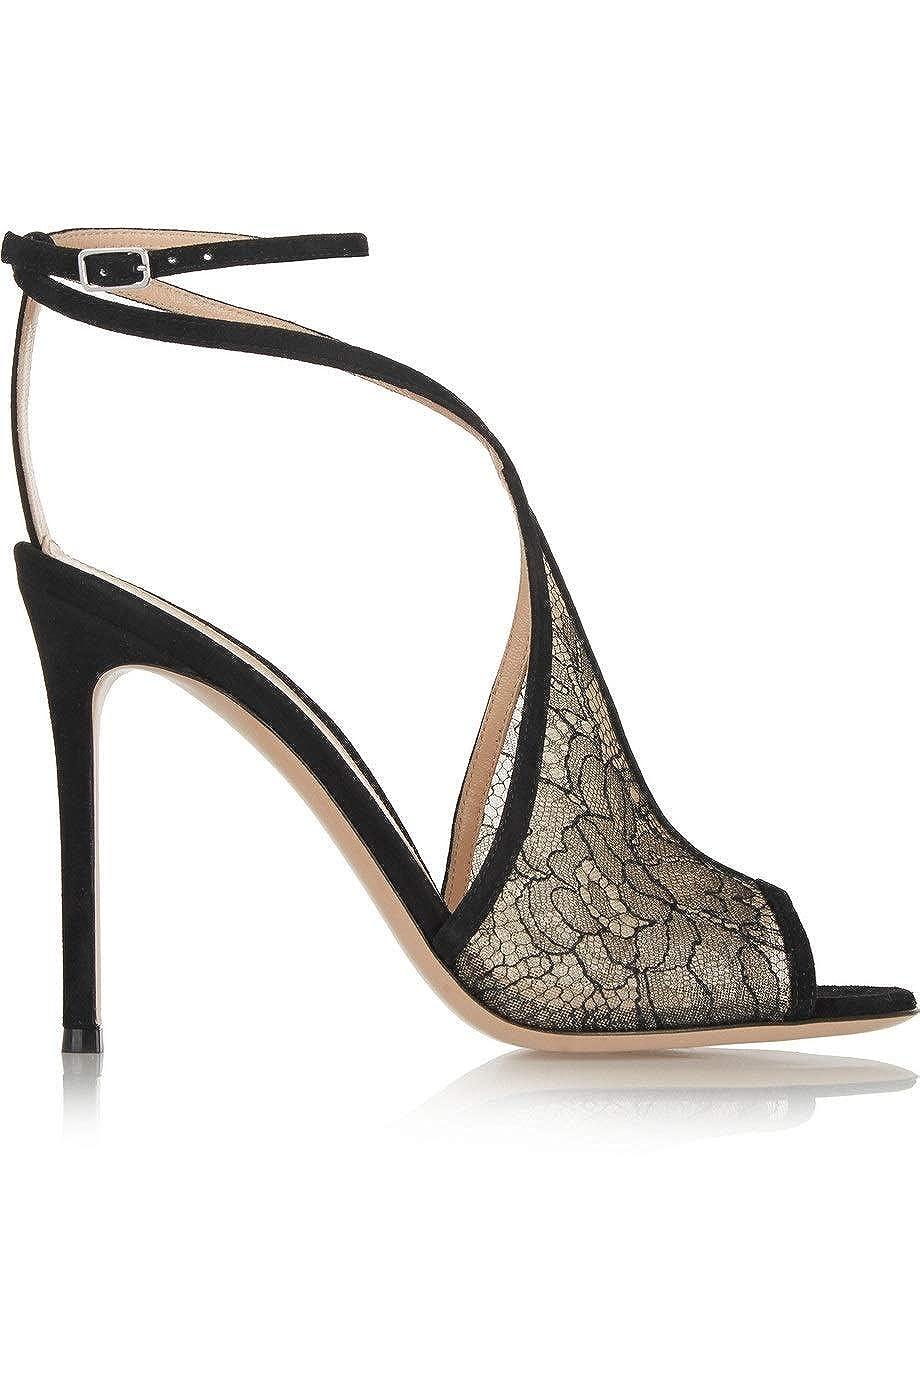 Black LIXUDITAN European Tide Women's shoes Black lace Back high Heel Sandals Fish Mouth Buckle mesh Sandals Fashion Sexy Women's shoes JDF®